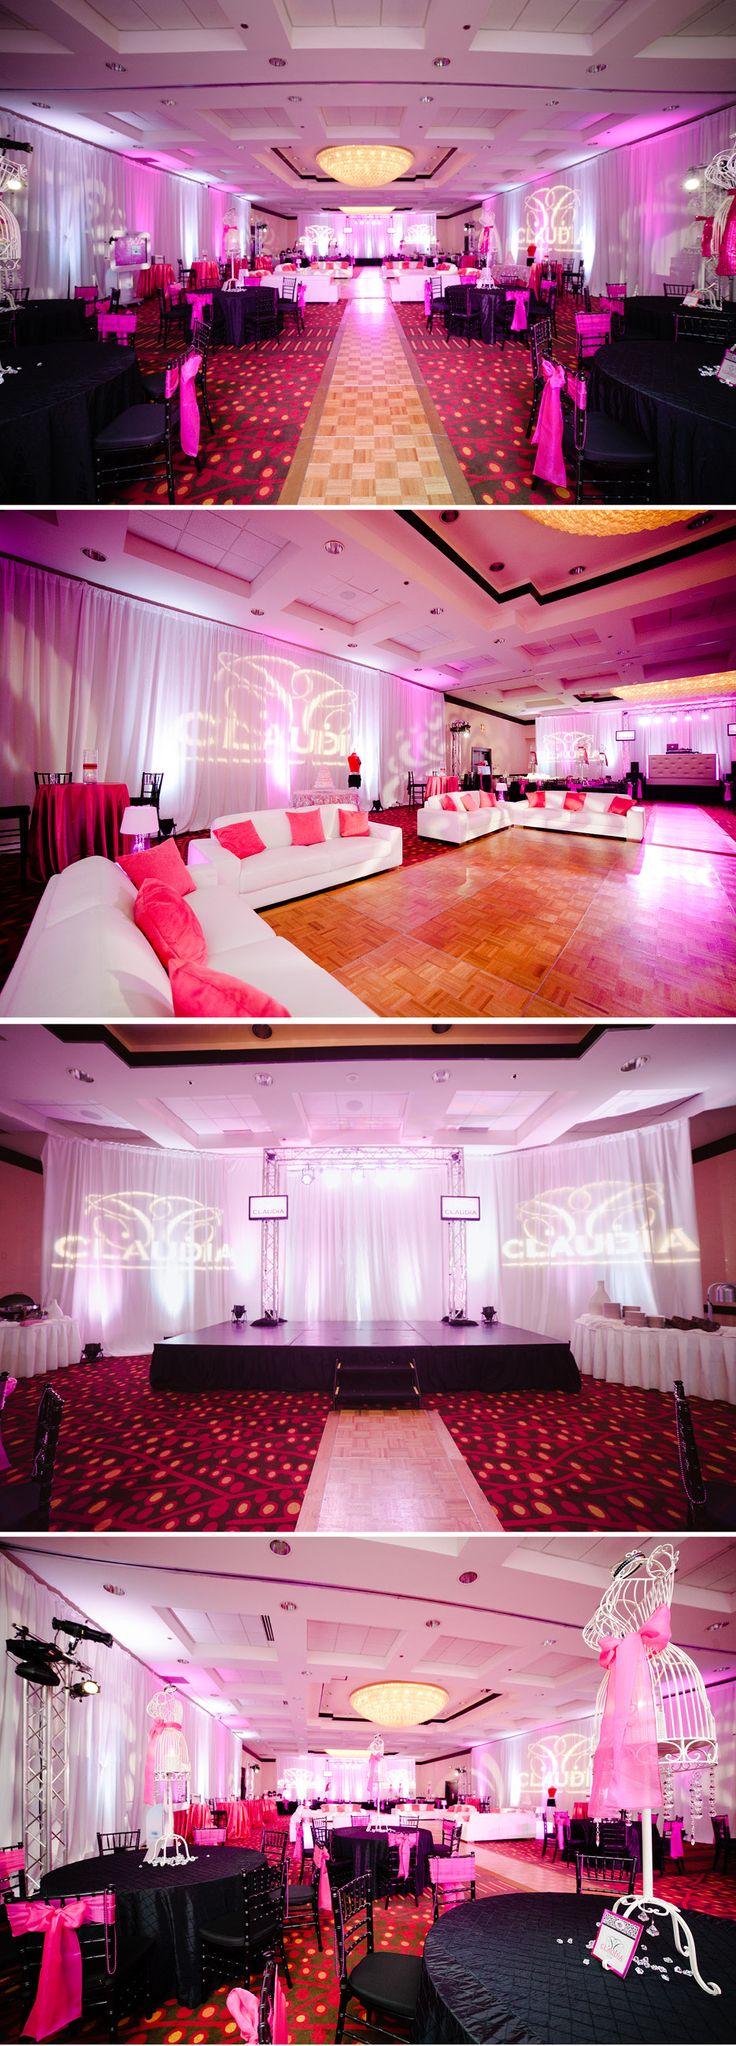 Quinceanera -Birthday Party -high fashion theme decor.